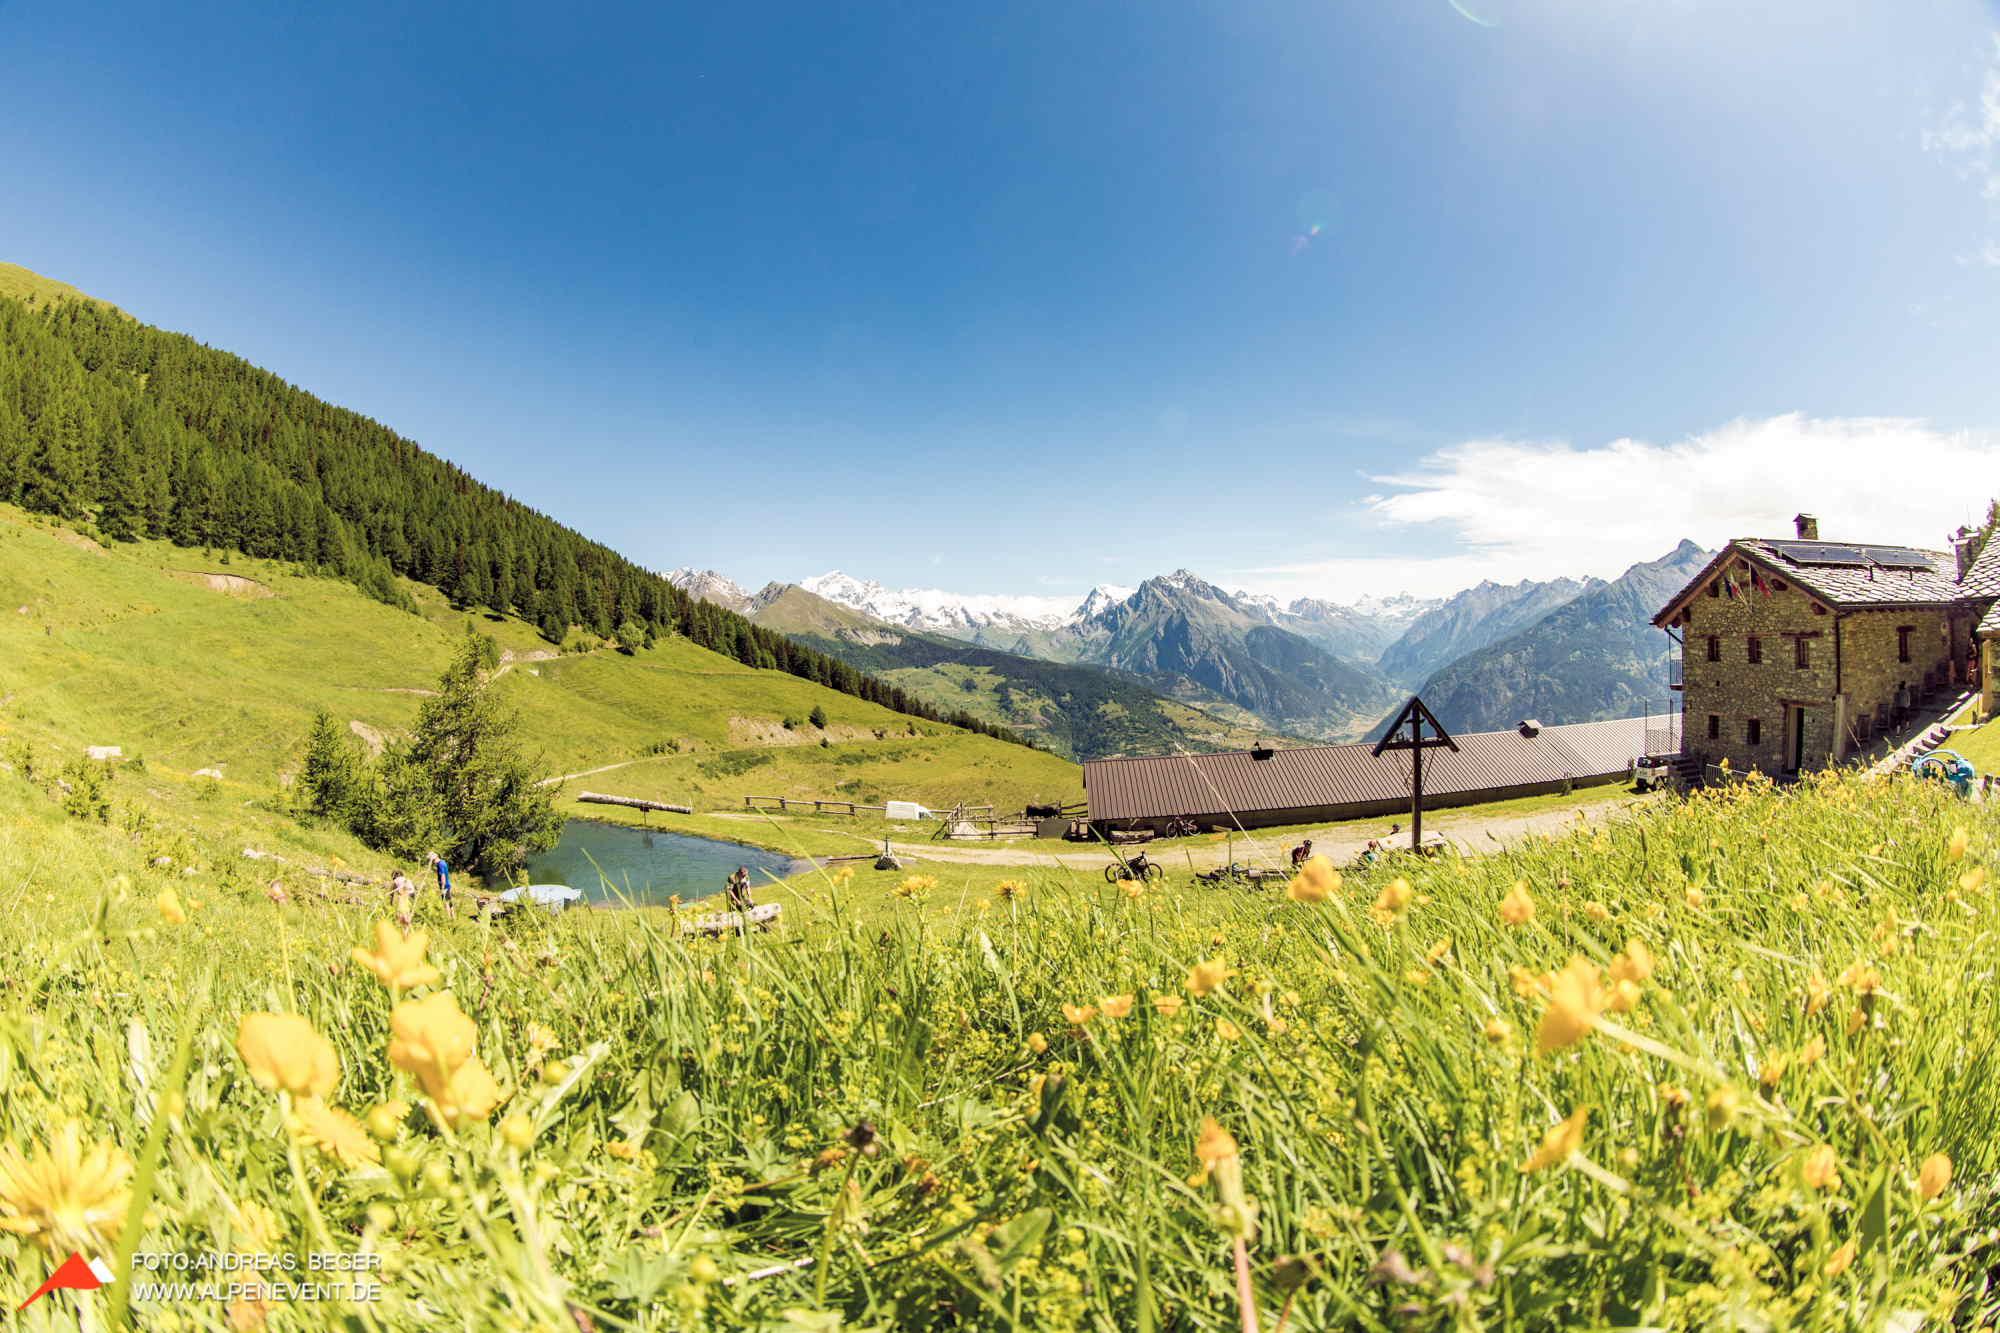 Alpine FlowRide Alpine Trails Mountainbike Freeride & Enduro Camp MTB Enduro Camp Individuelle Tourenbplanung Ride on am Mont Blanc